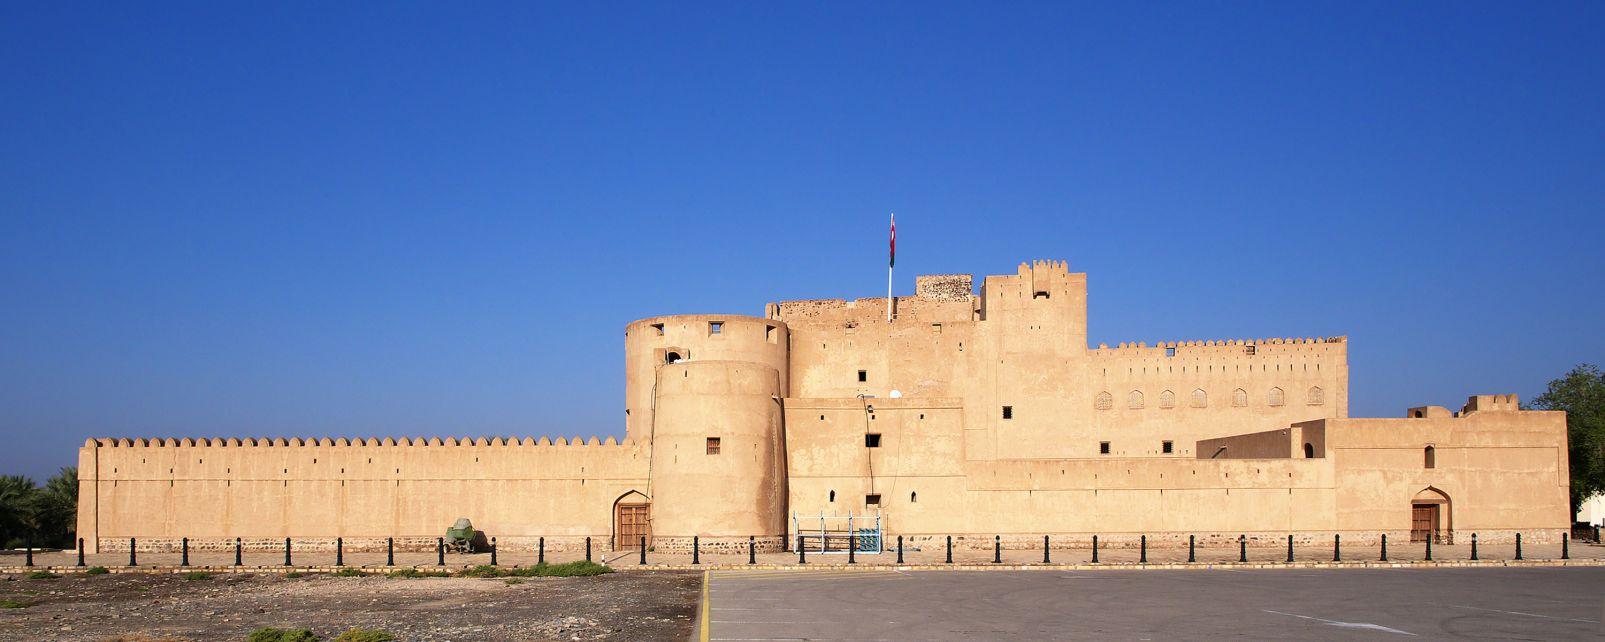 Les monuments, Jabrin, Oman, Jabreen, fort, chateau, fortification, désert, sultanat, moyen-orient, proche-orient, Bahla, Ad Dakhiliyah